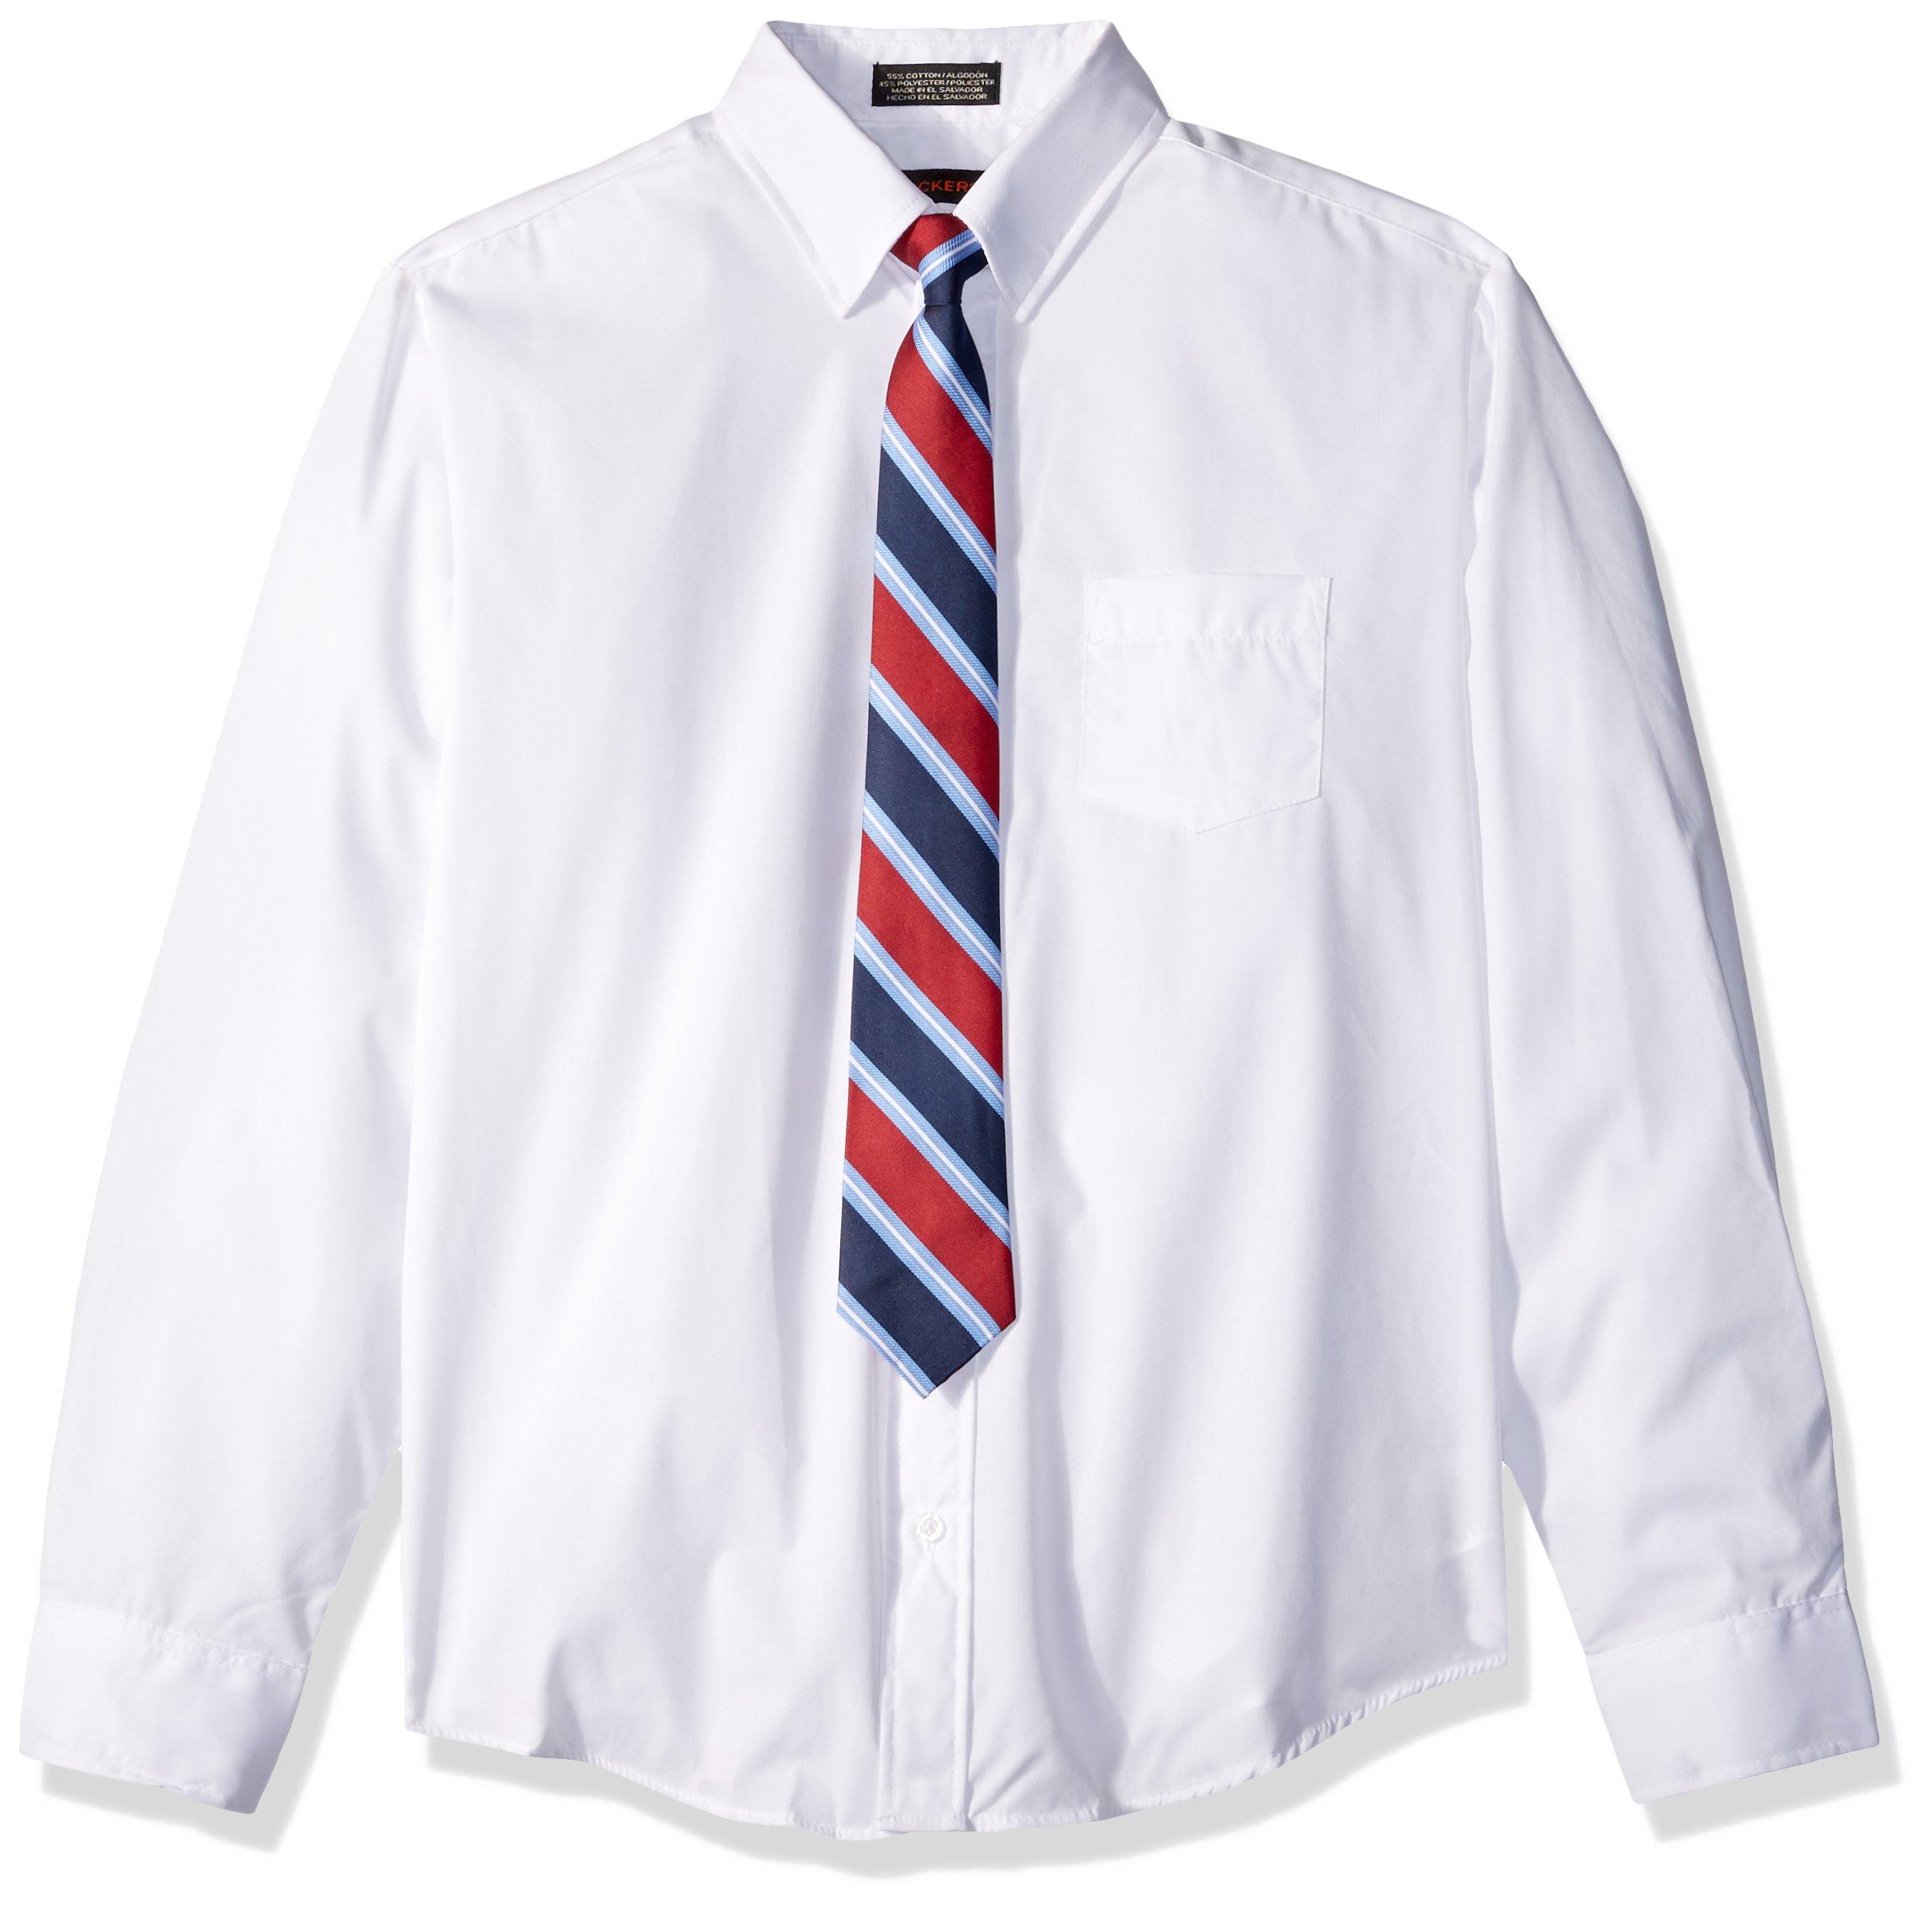 Dockers Big Boys' Dress Shirt and Tie Set, New White, 10